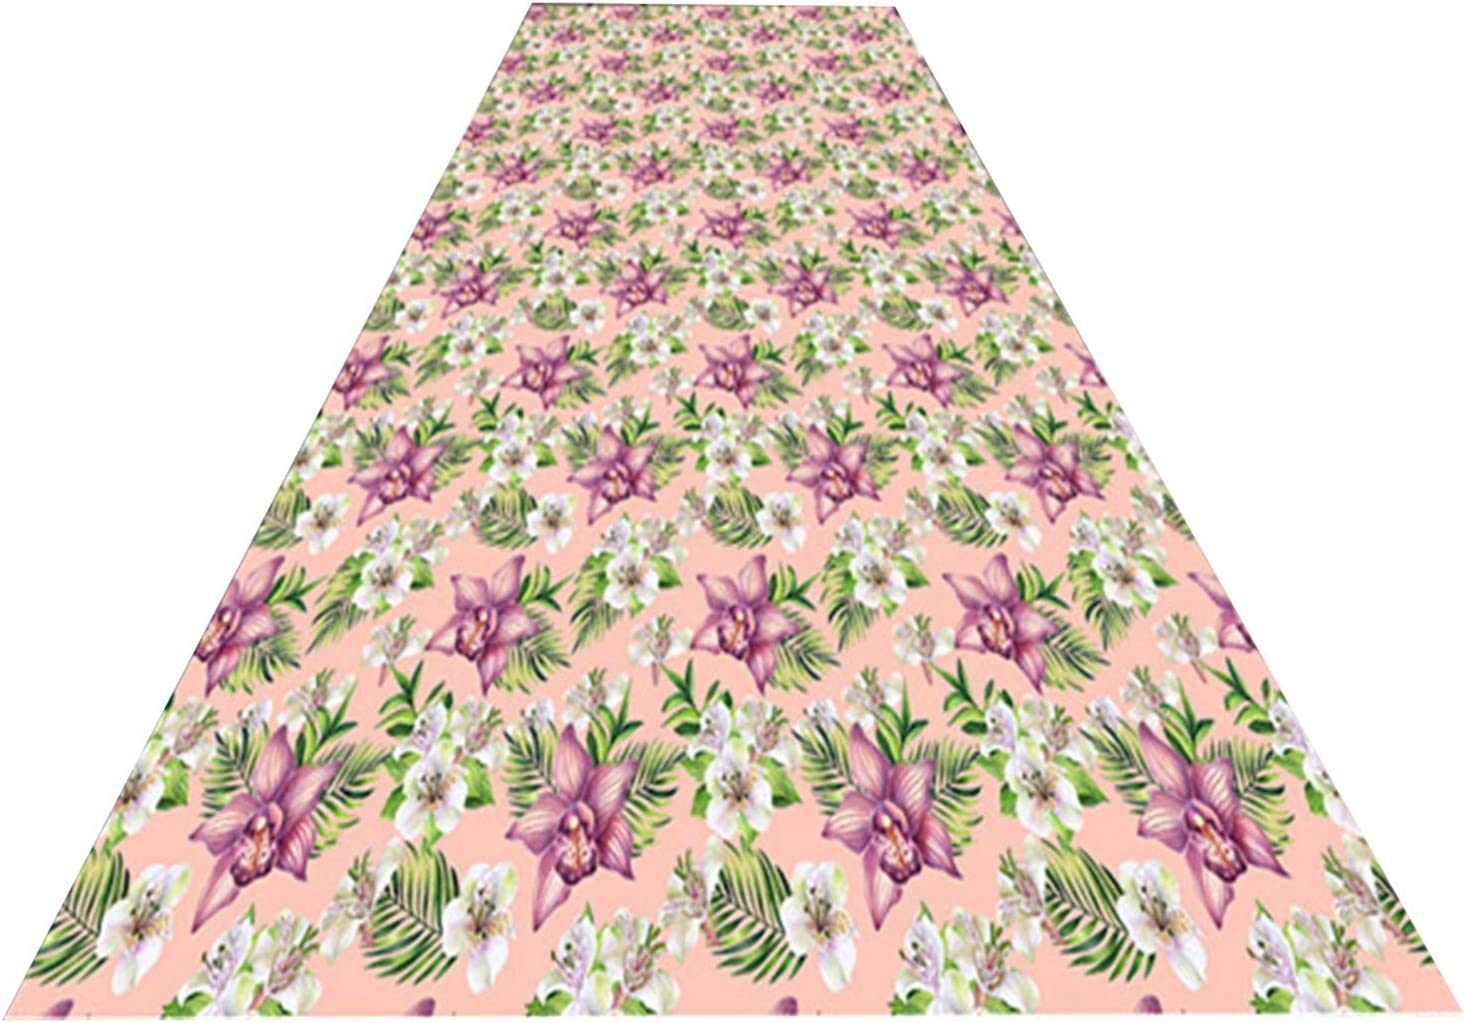 Branded goods MHSXHXY Corridor Carpet Beauty products Non Slip Narrow Entrance Hall Mat Runner